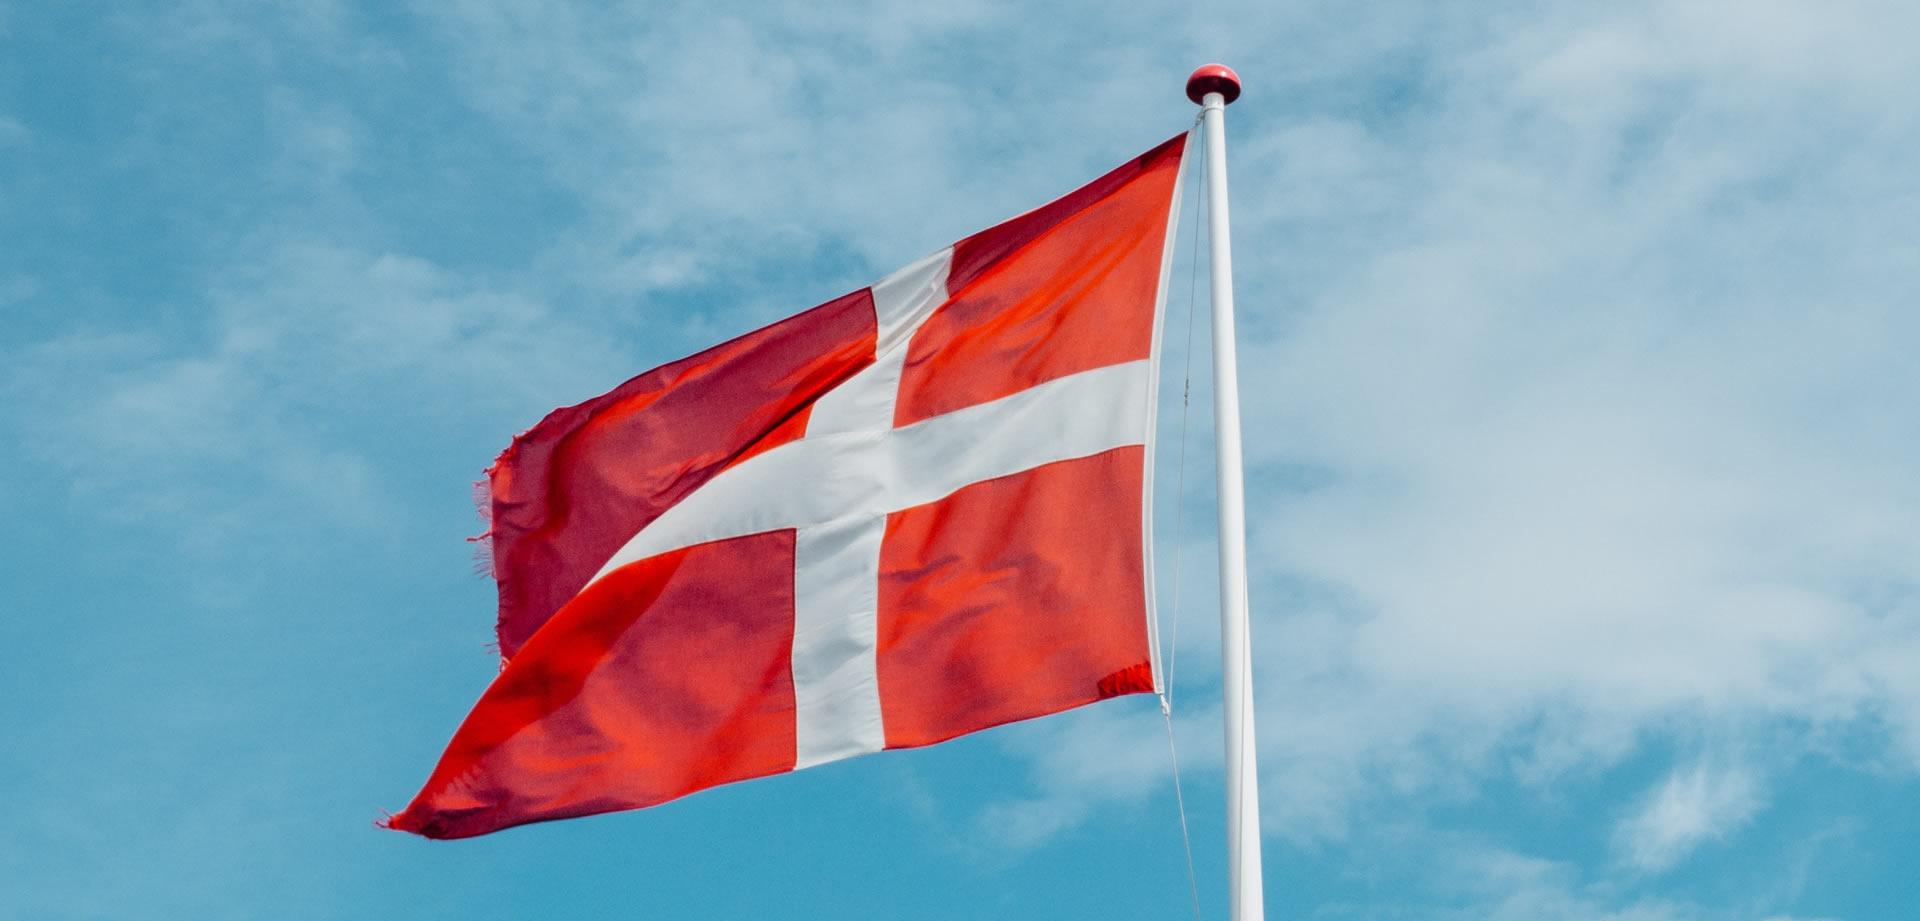 Kingdom Business i Danmark